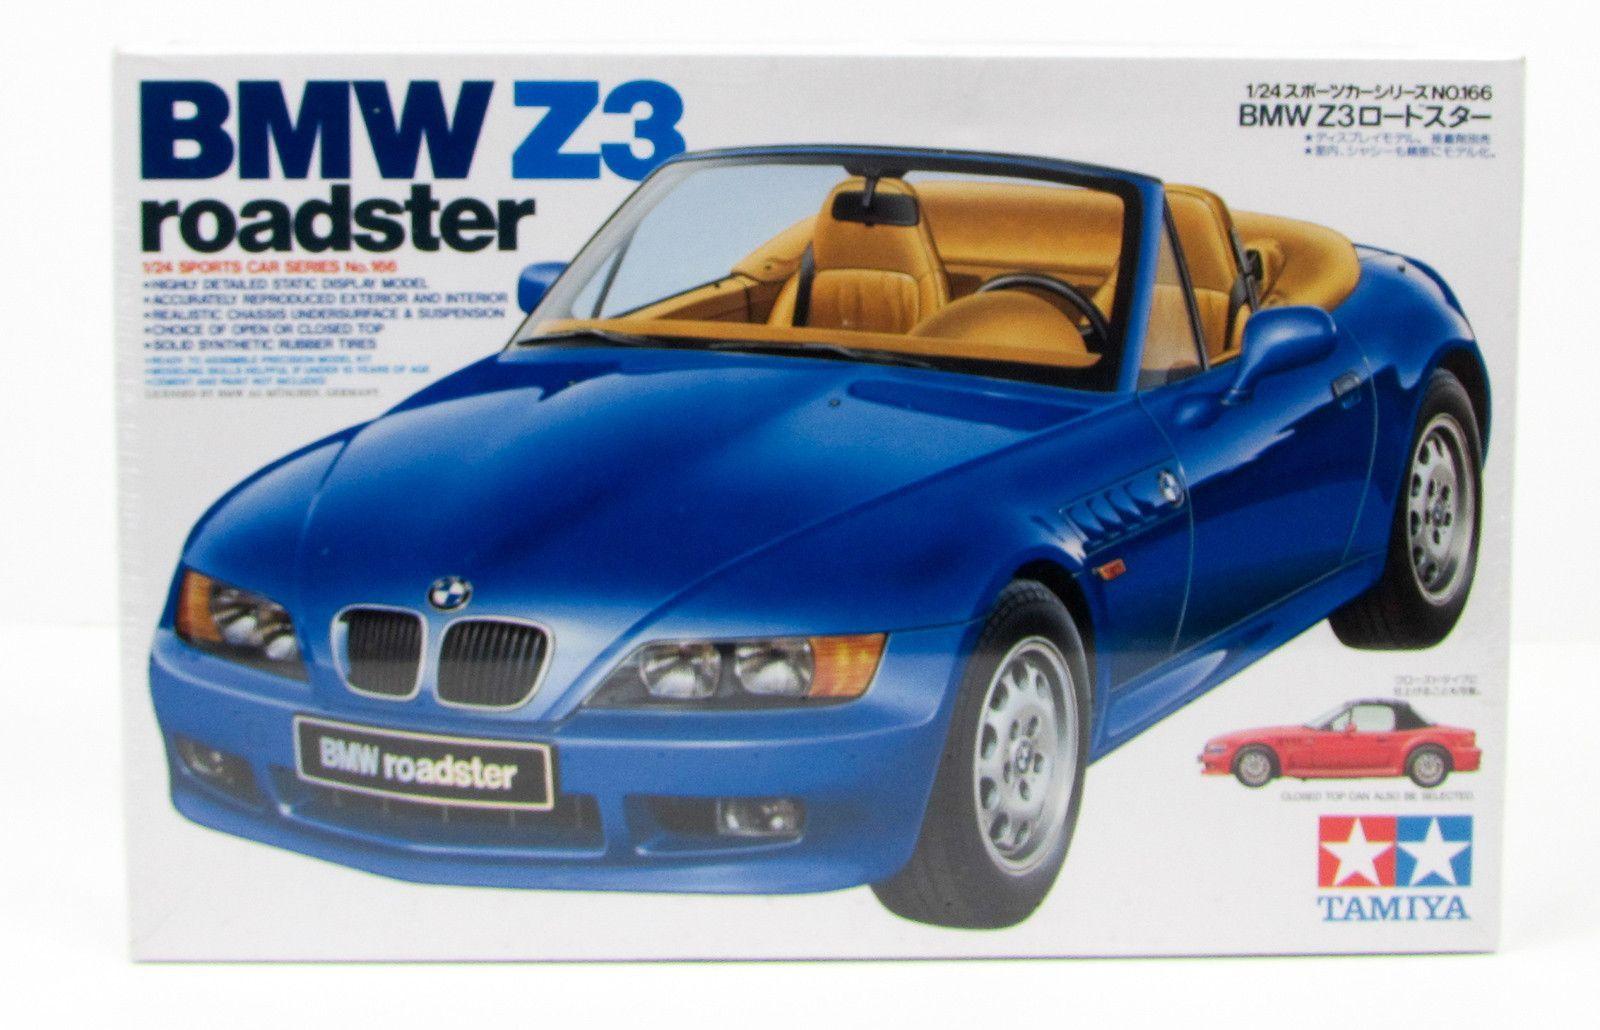 Bmw Z3 Roadster Tamiya 24166 1 24 New Car Plastic Model